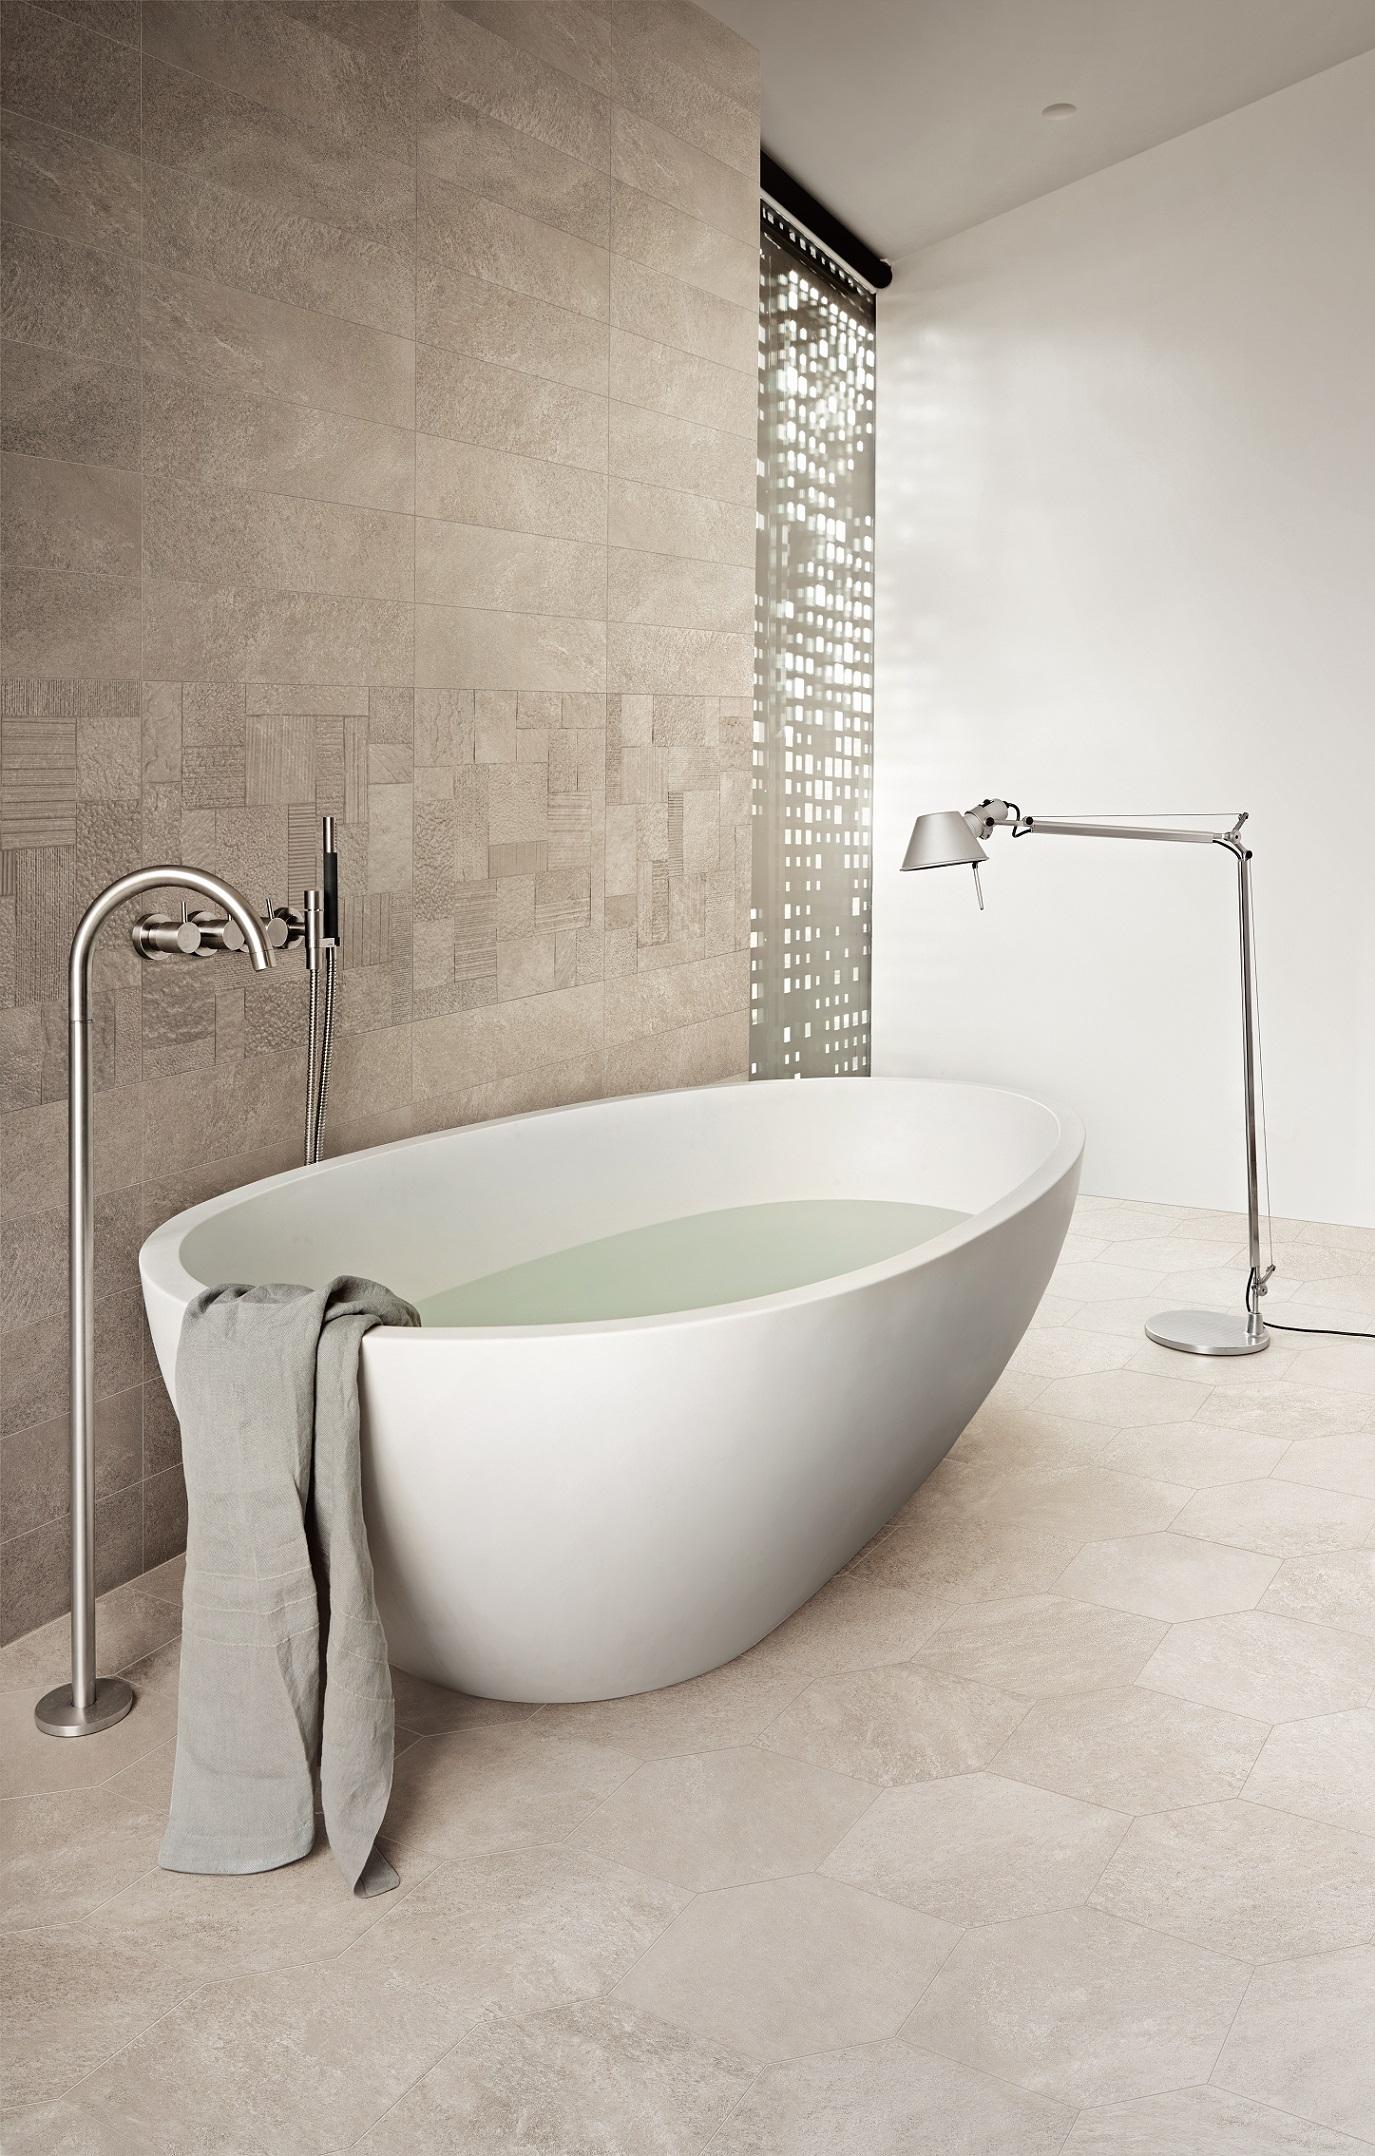 shadestone_bathroom_taupe1560 nat-mix taupe6060 nat-code stone light nat_